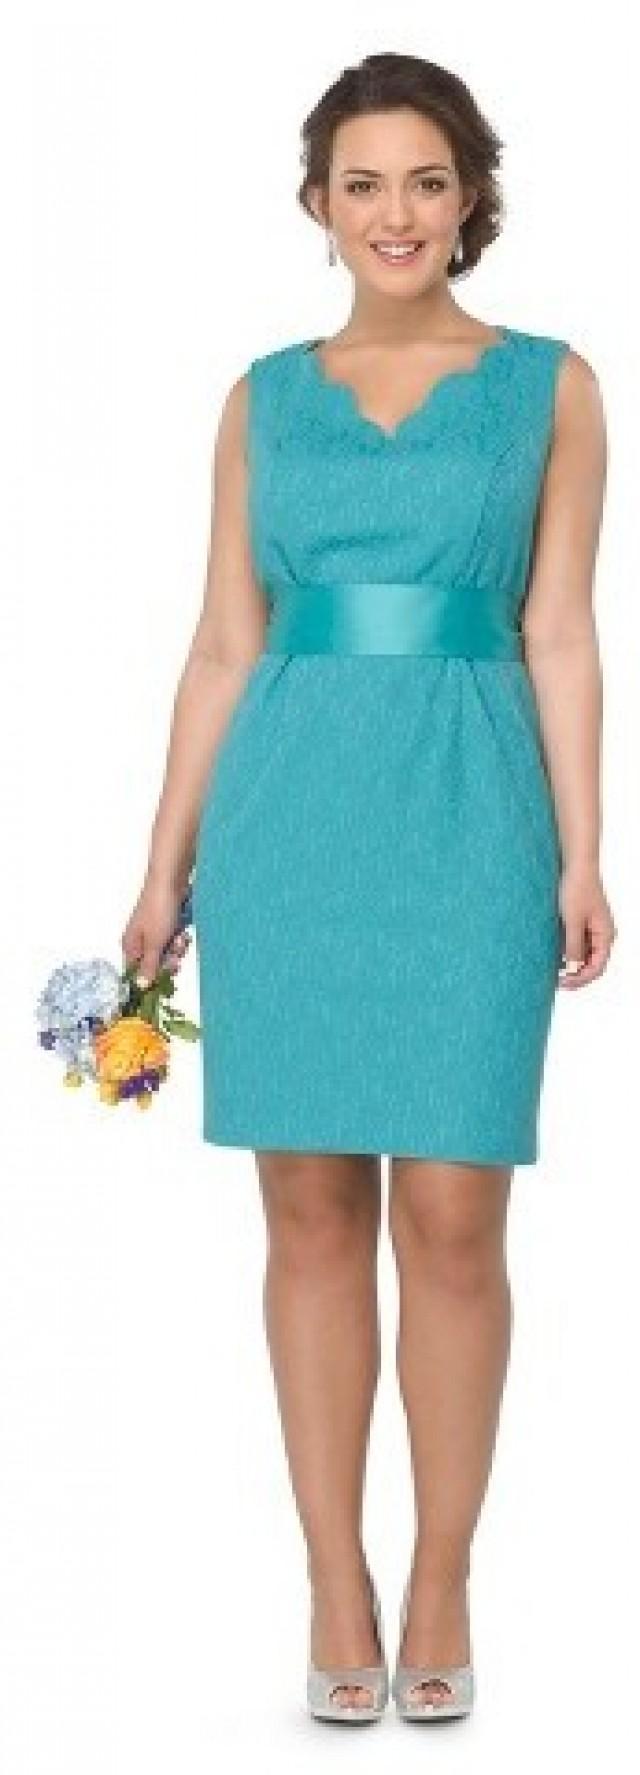 Turquoise Bridesmaid Dresses Plus Size